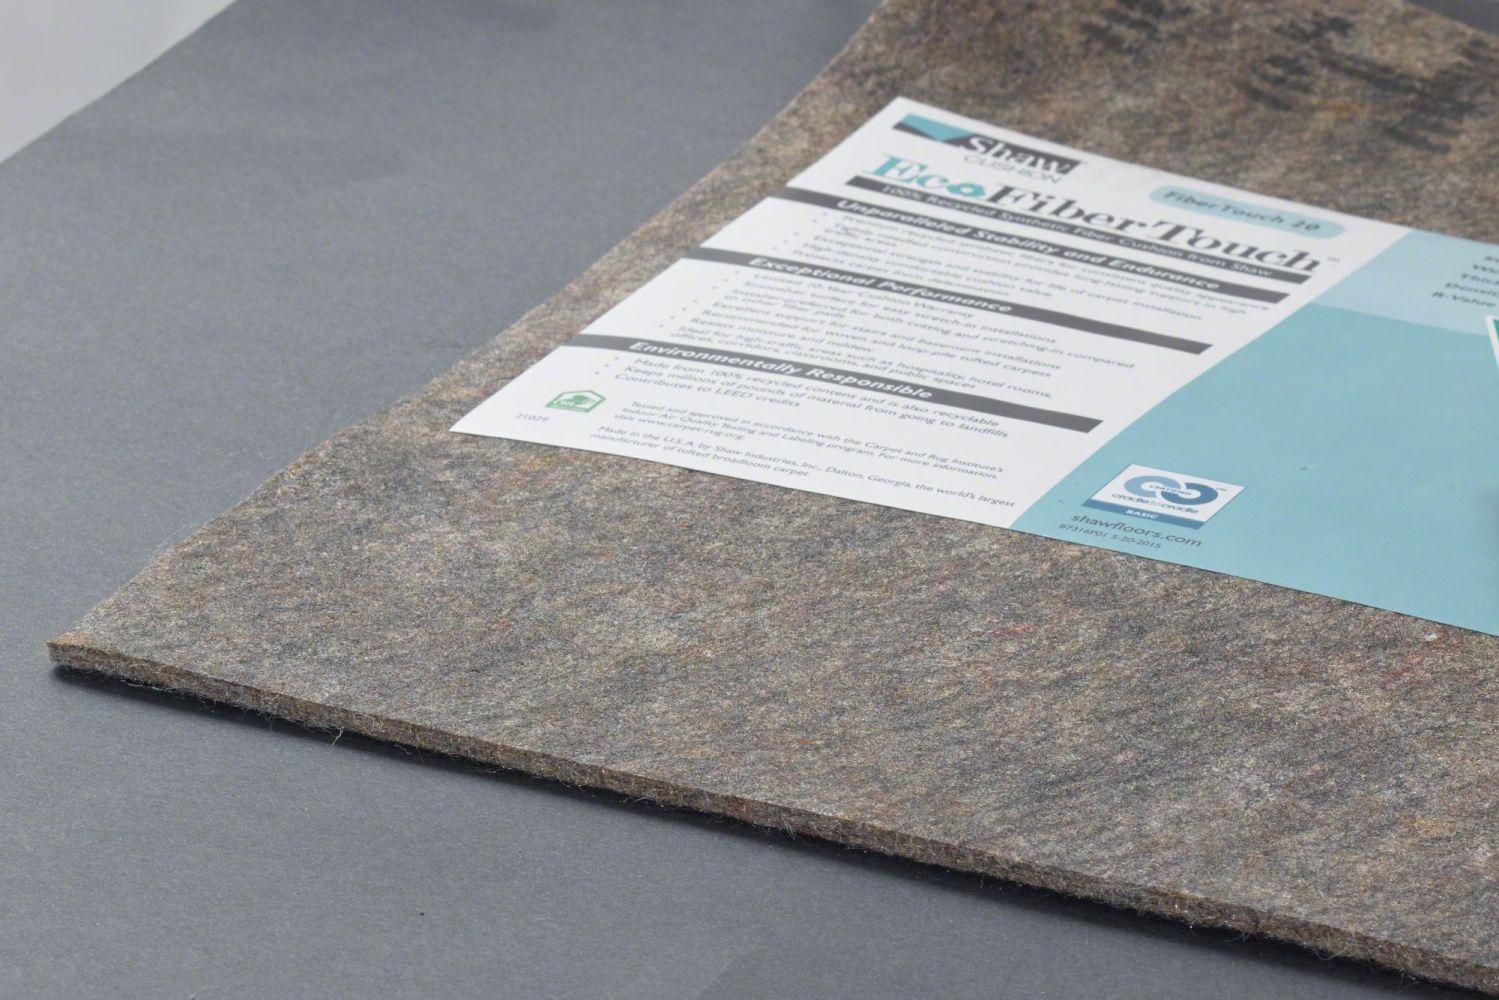 Shaw Floors Eco Edge Cushion Fibertouch 20-6 Grey 00001_228FT